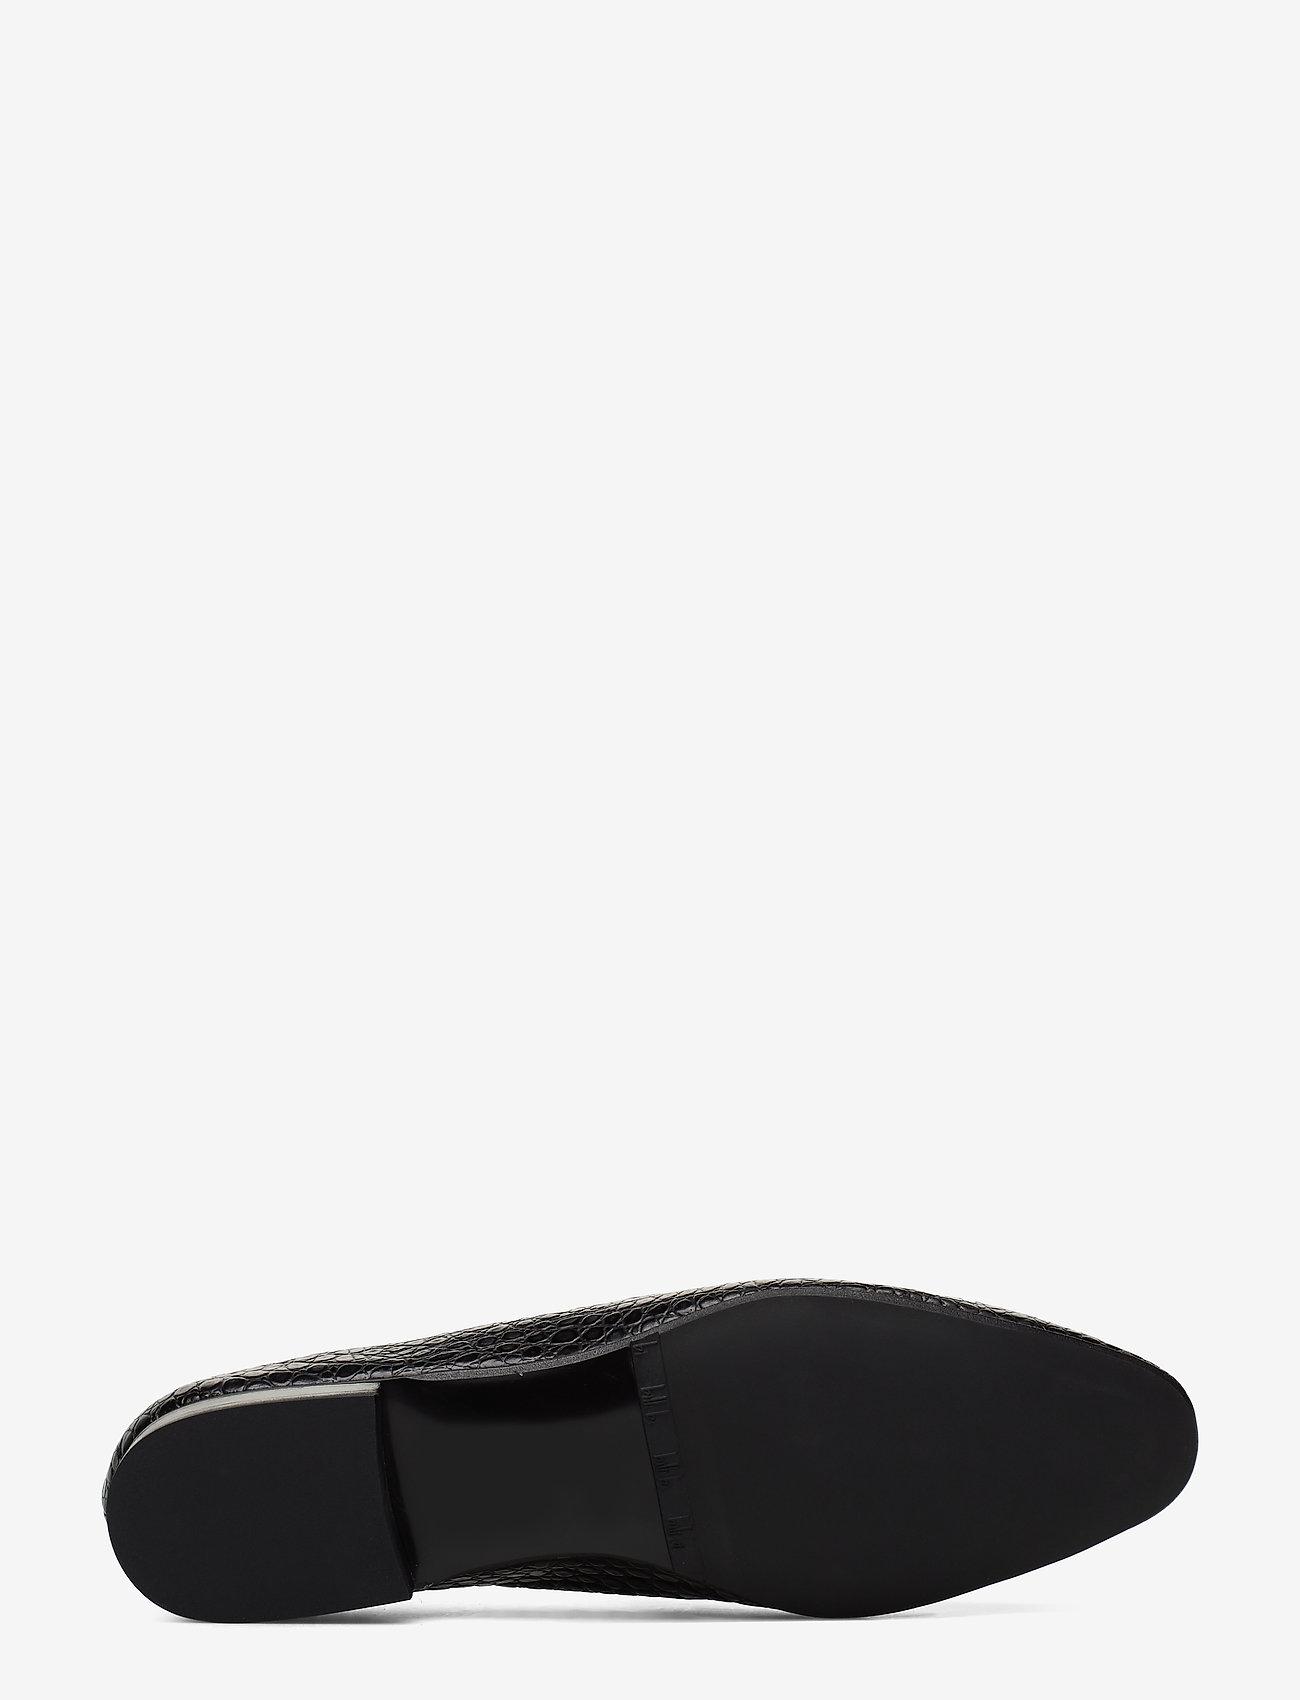 Shoes 4521 (Black Yango 10) - Billi Bi